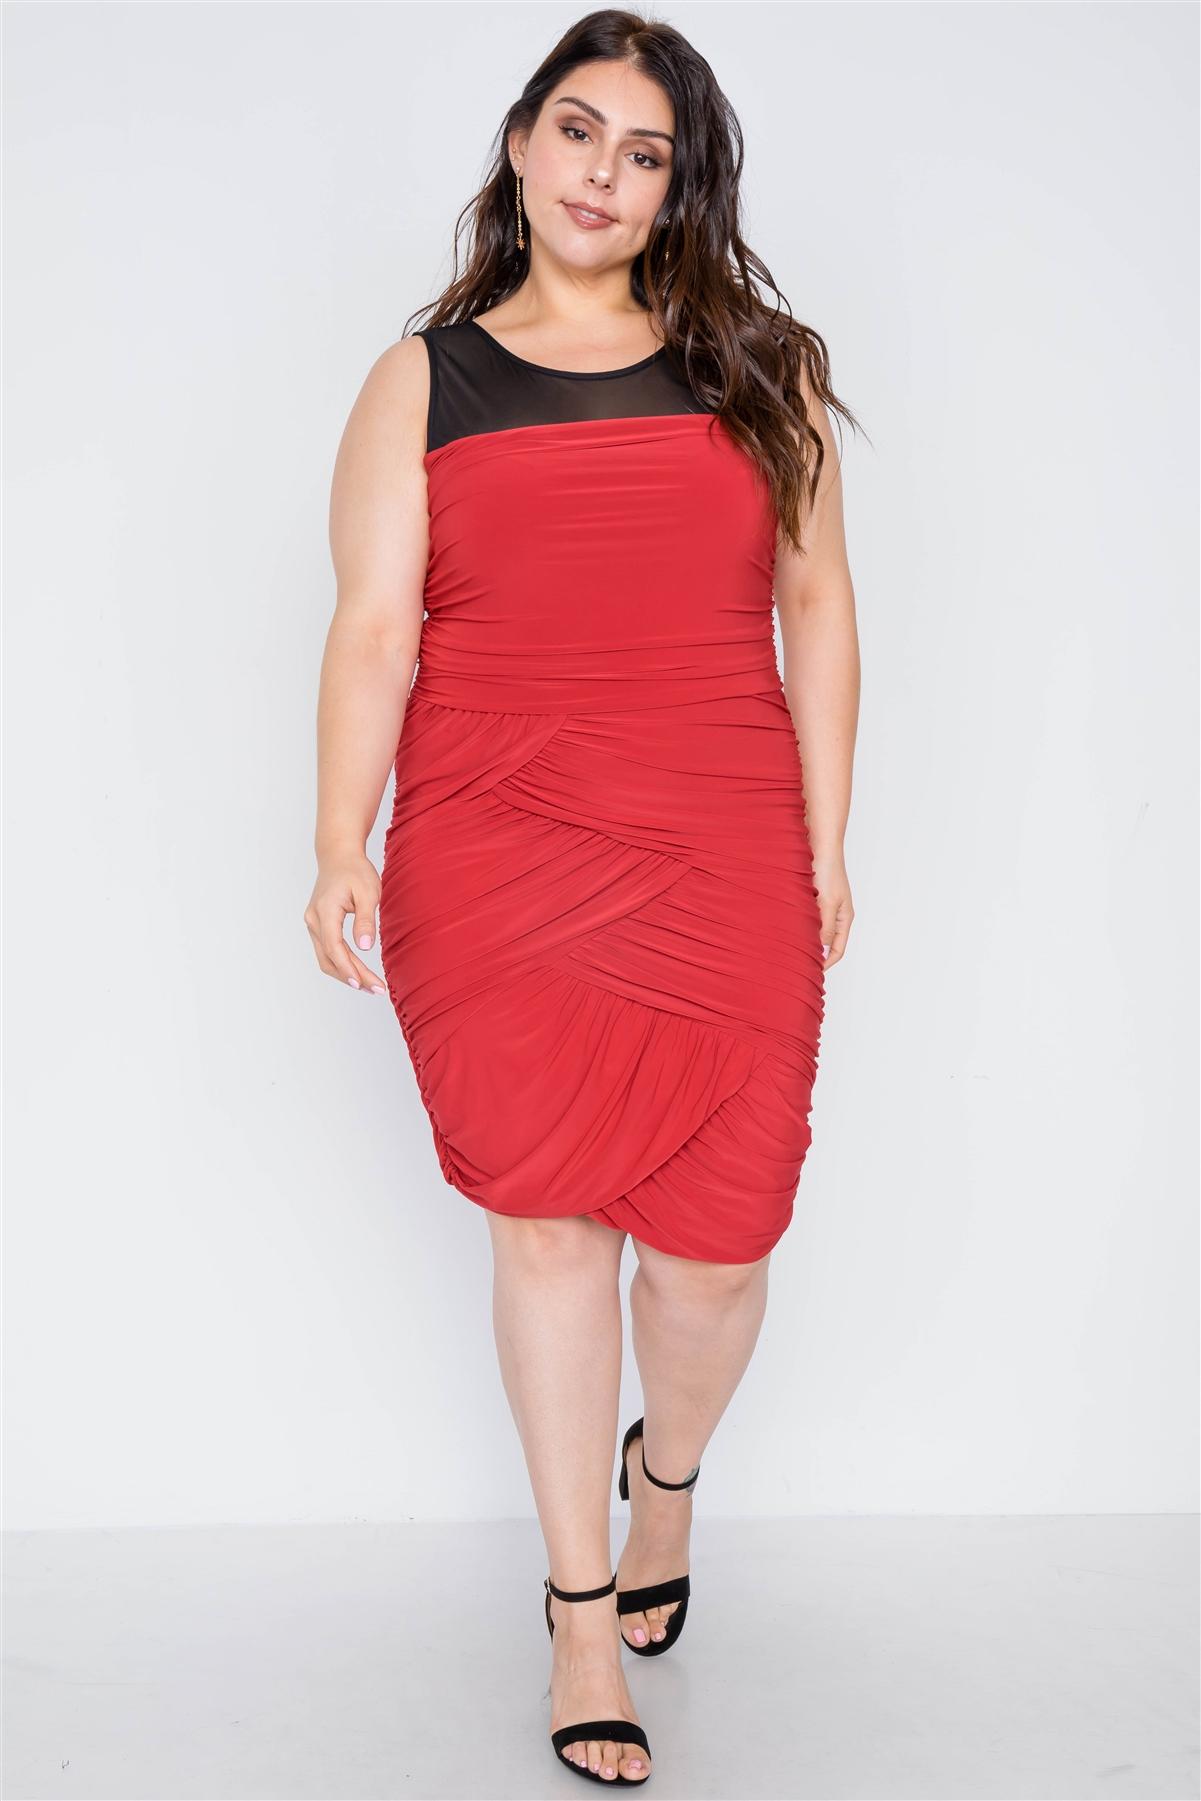 Plus Size Black Red Combo Bodycon Mini Dress